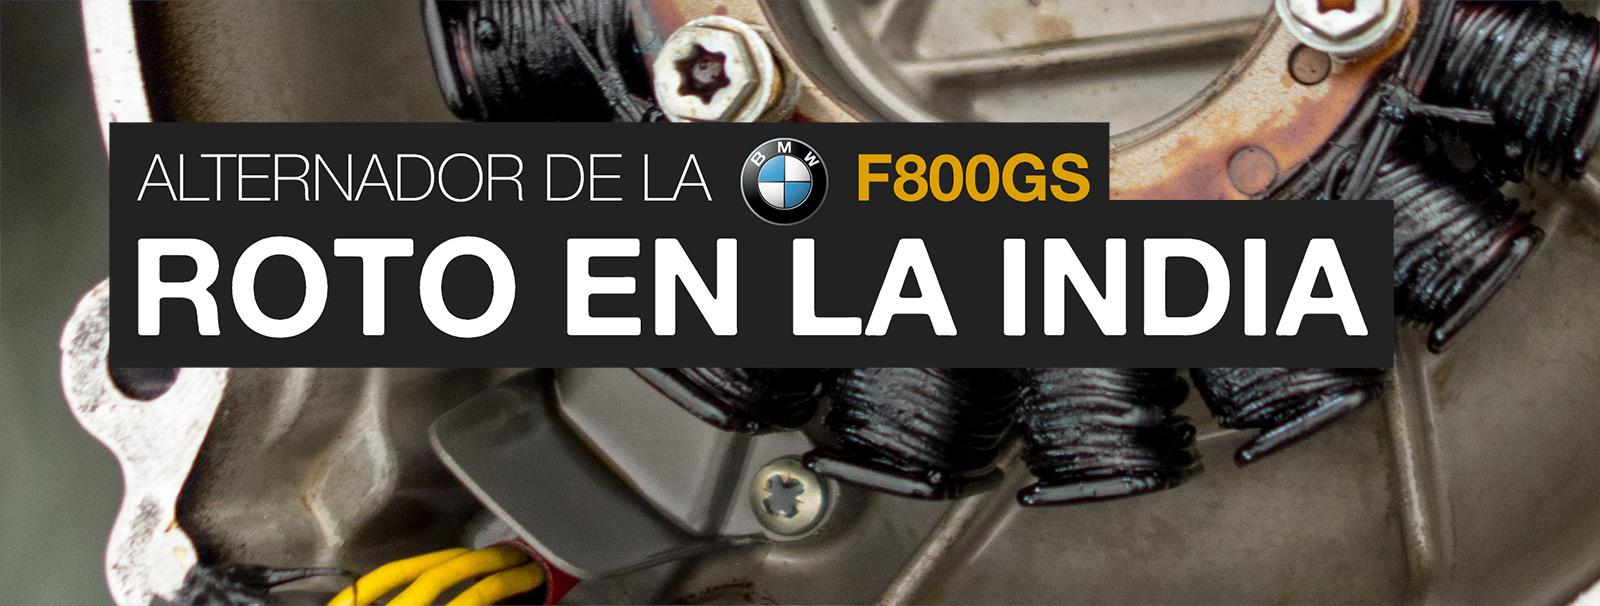 Alternador de la BMW F800GS roto en la India